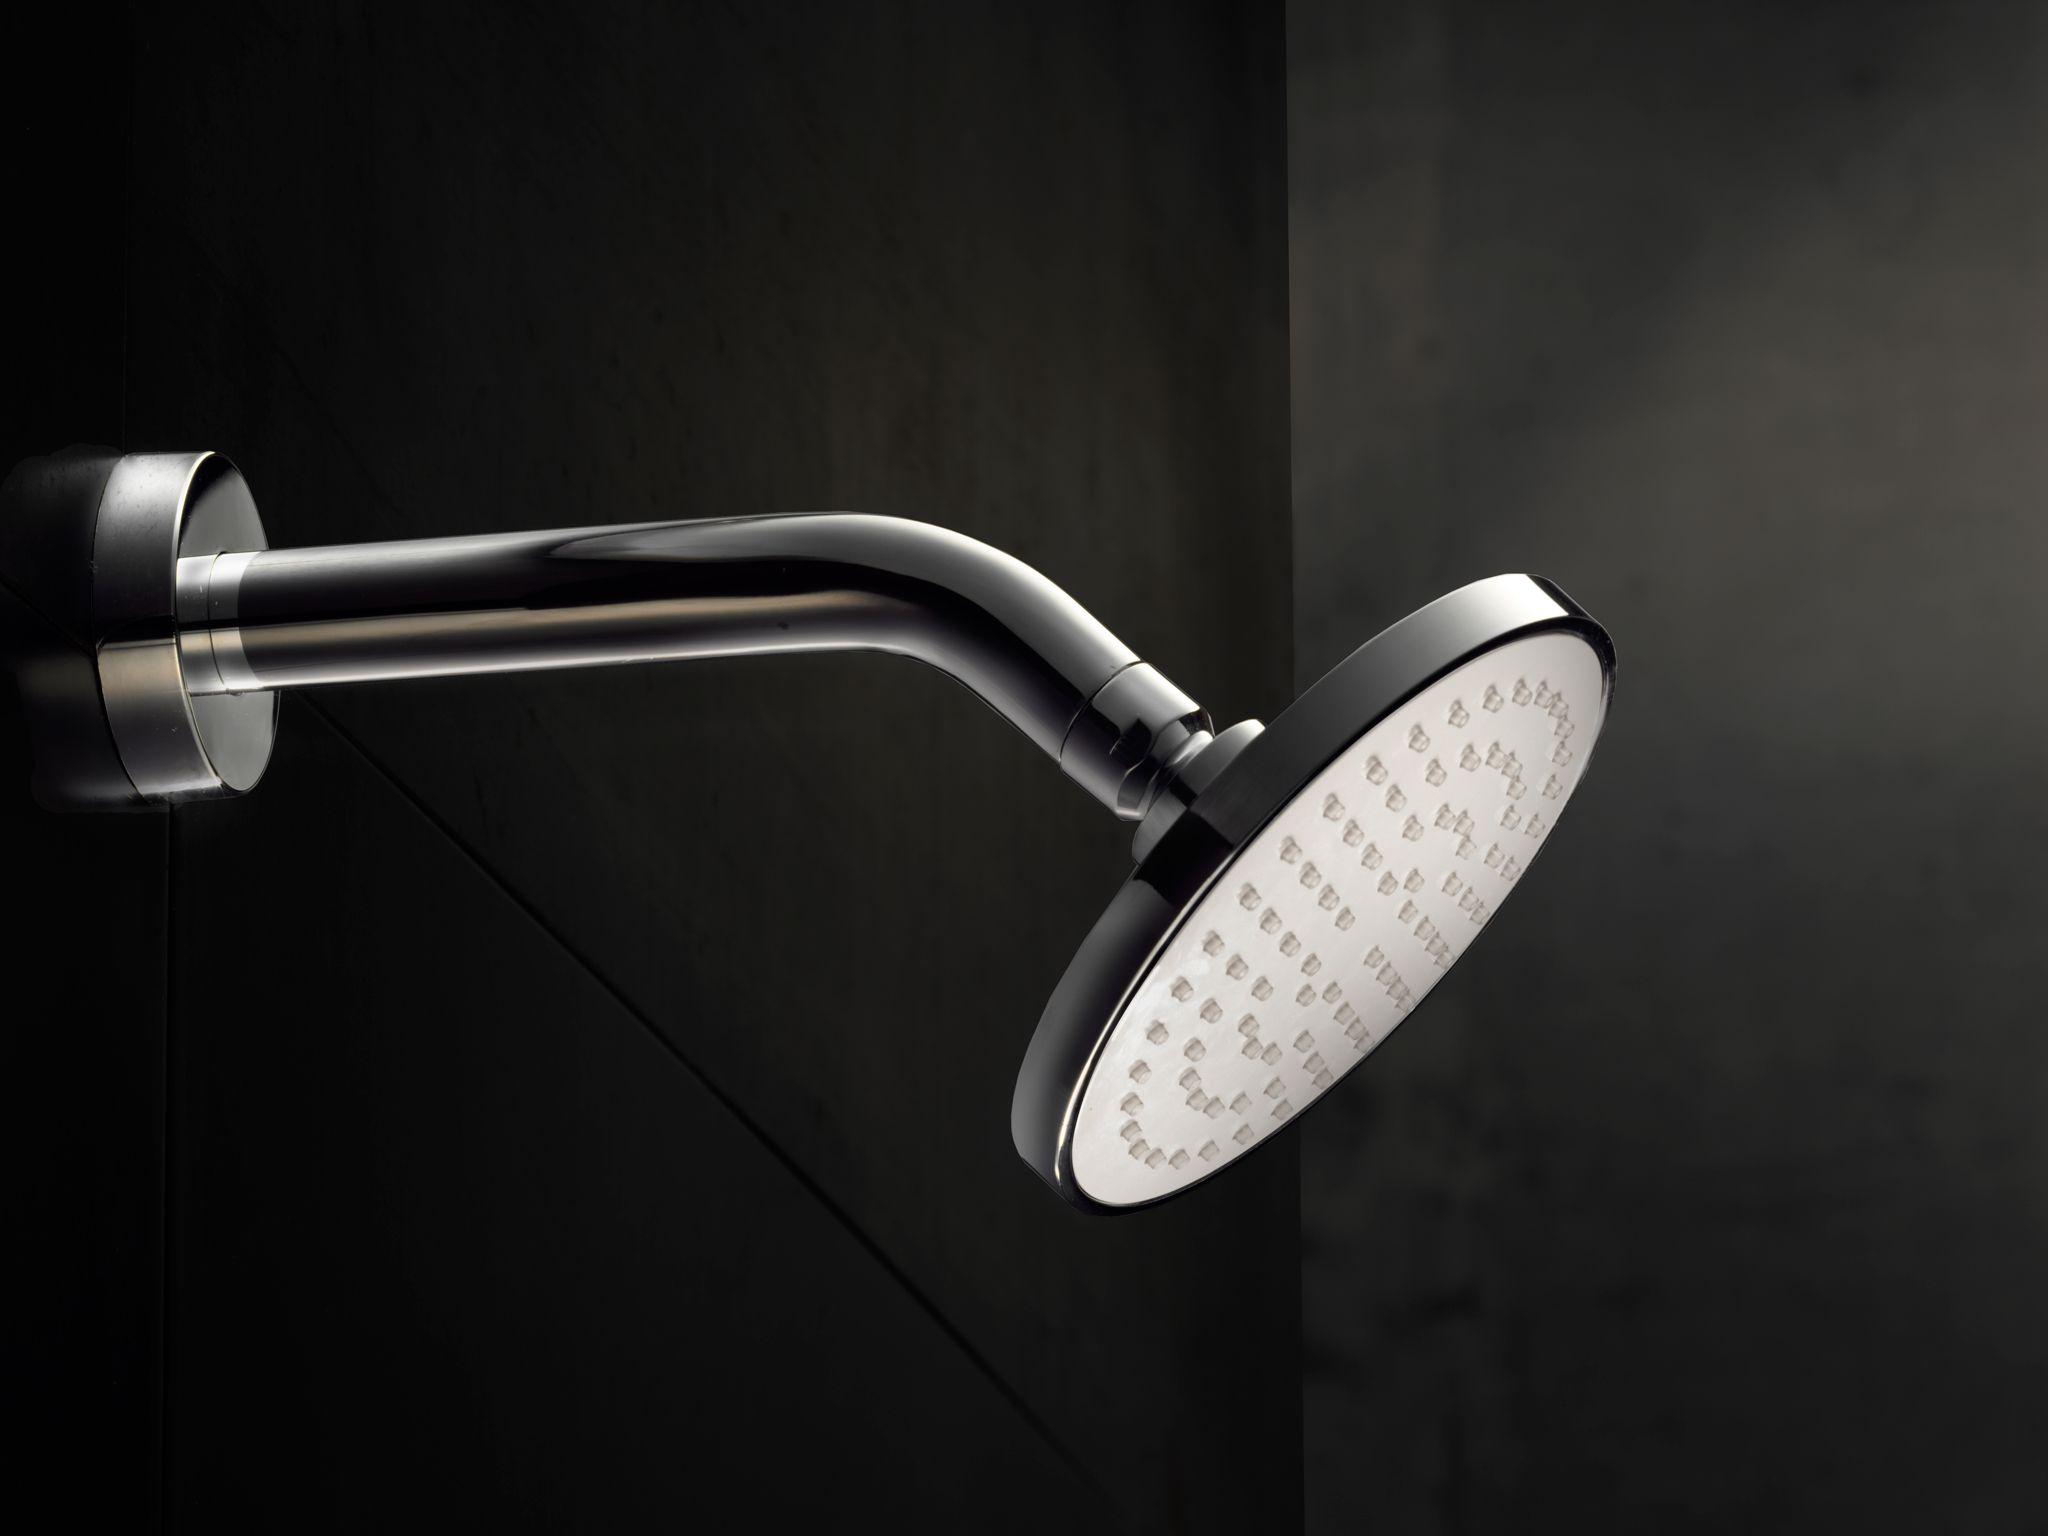 New Matki Air Eco Fixed Shower Head | Bathroom | Pinterest